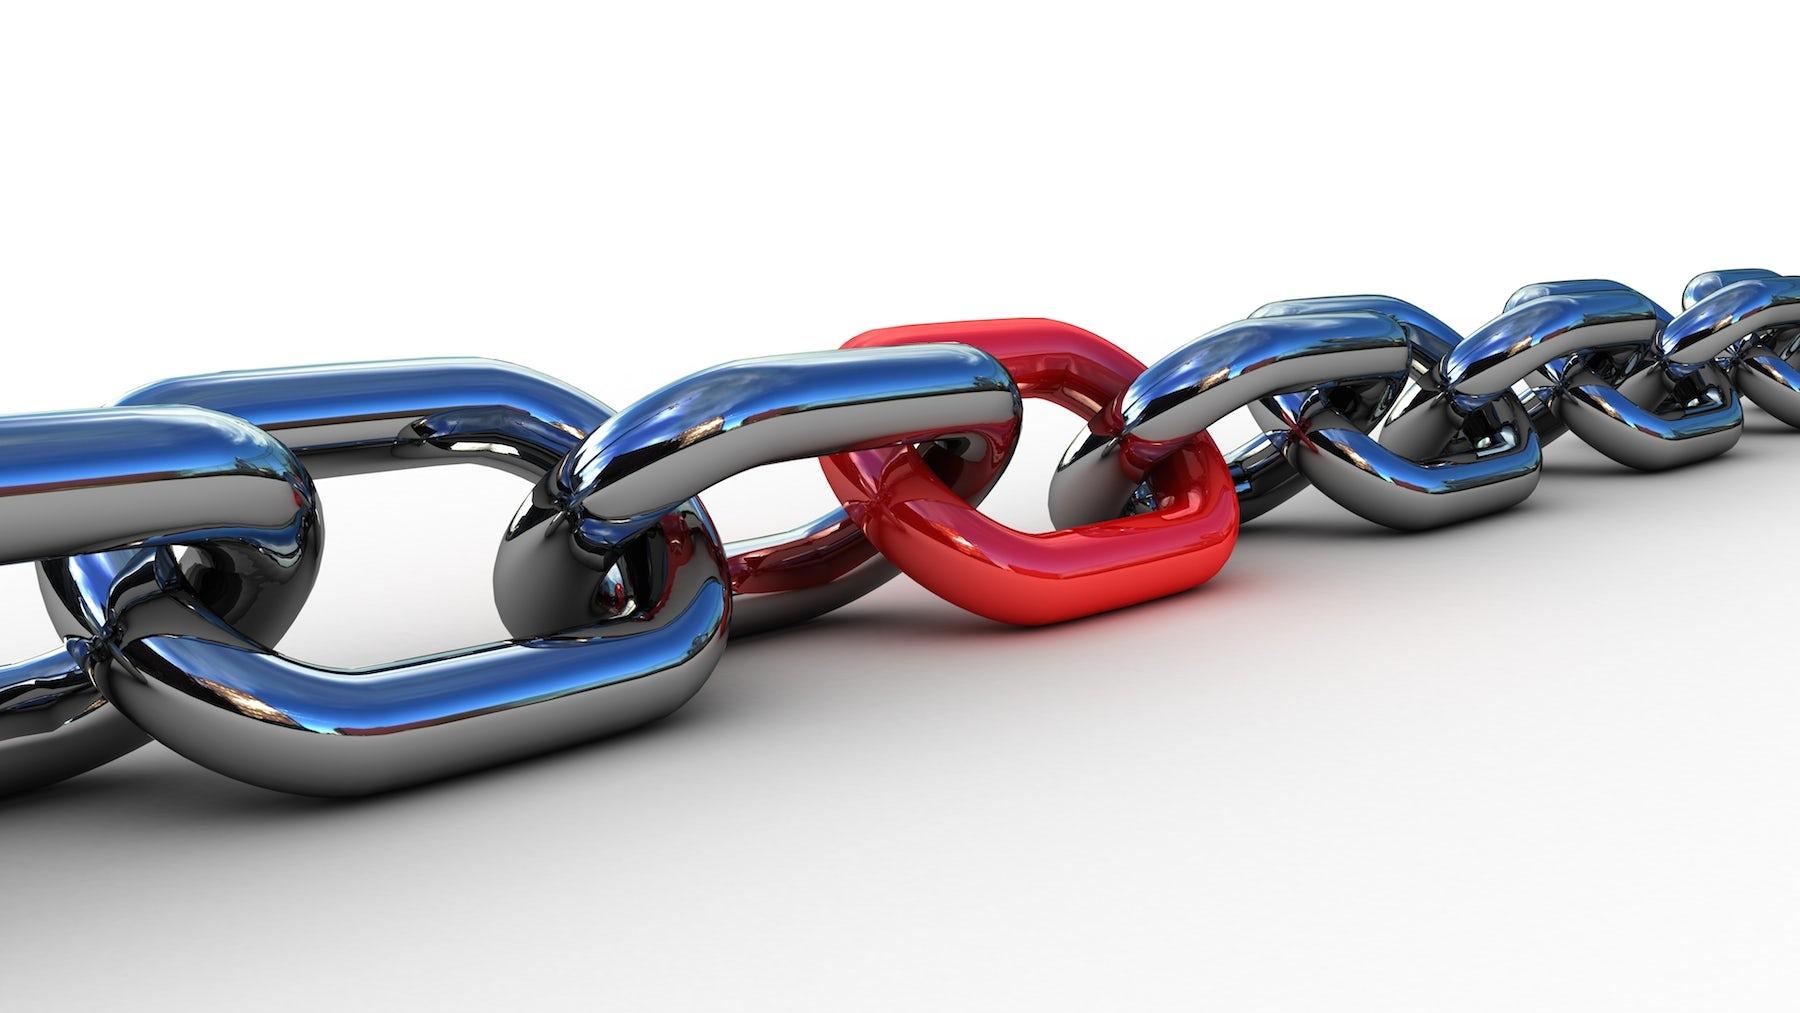 A chain | Source: Shutterstock